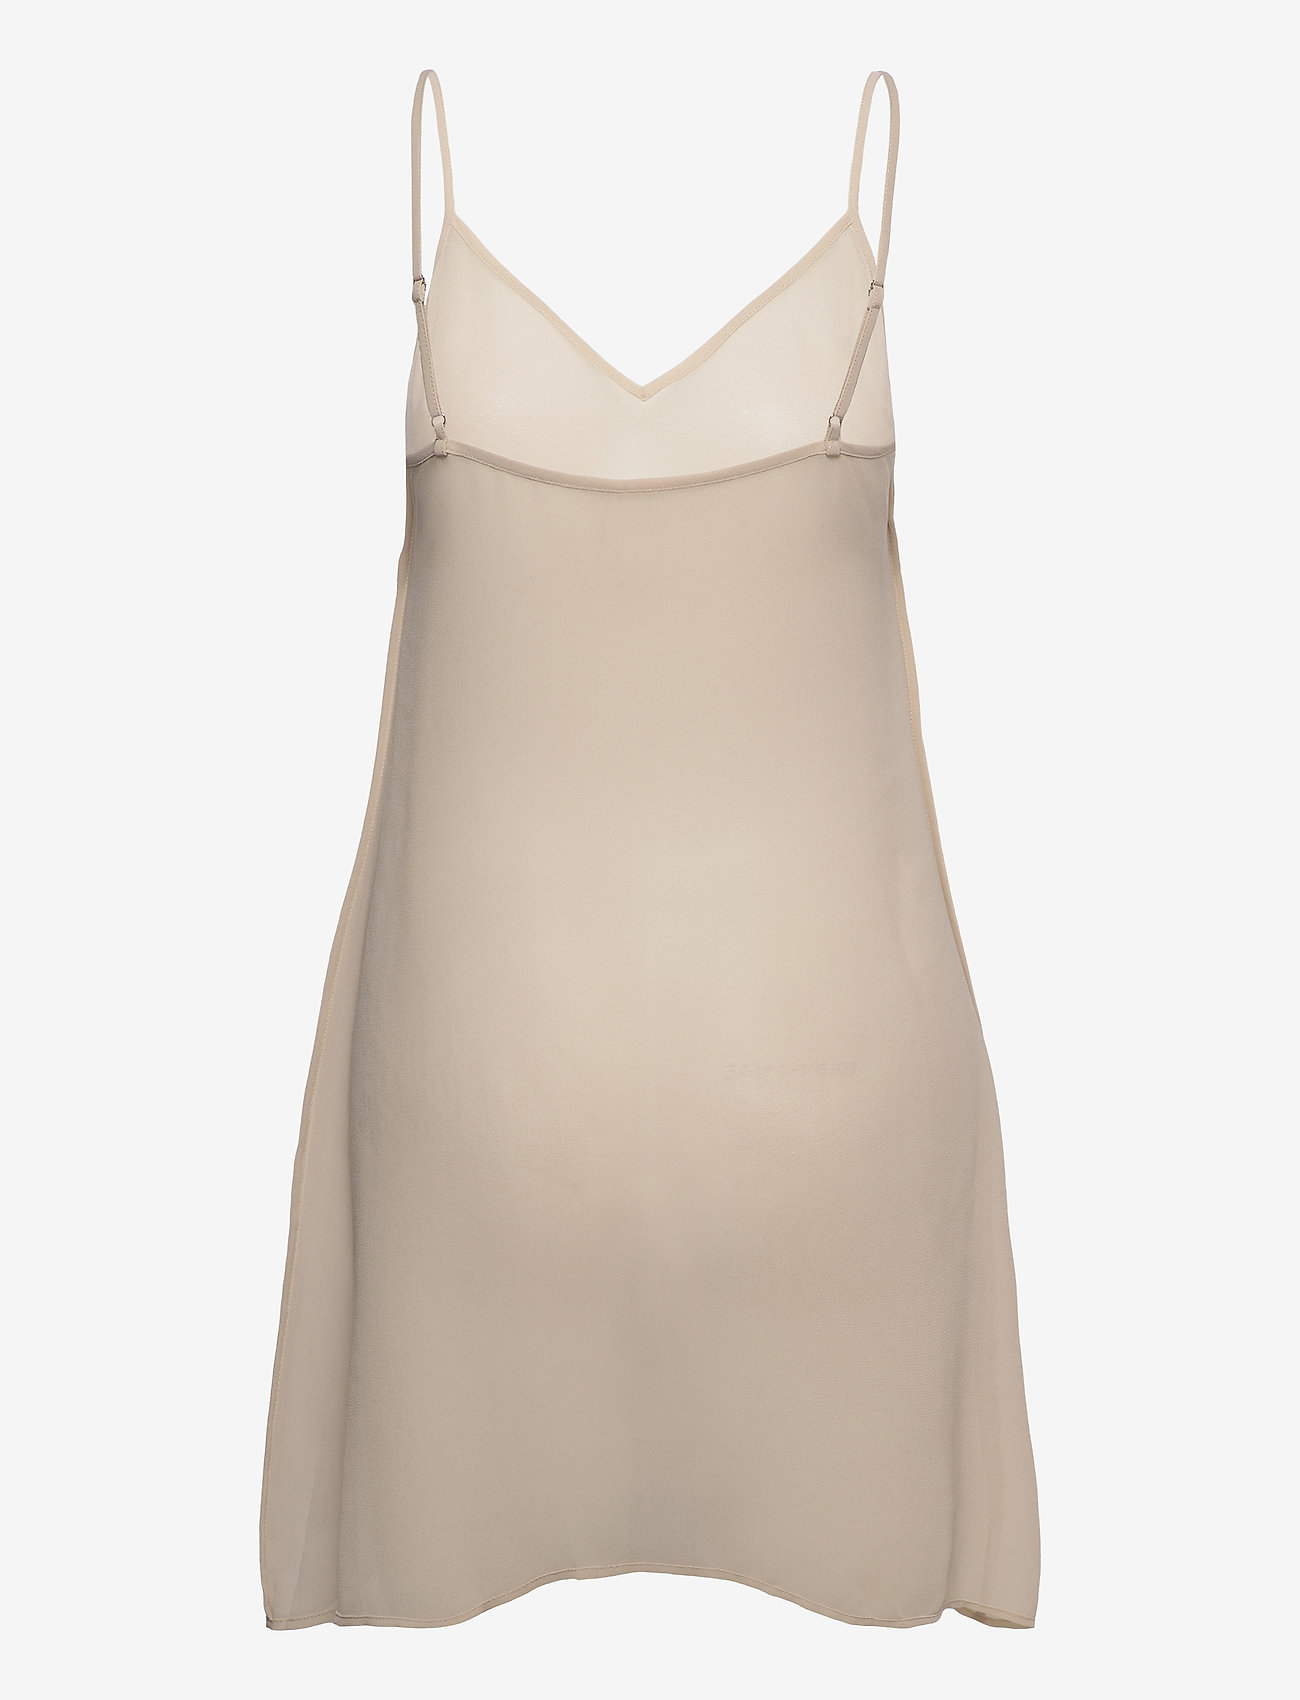 Samsøe Samsøe - Jolie short dress 12697 - summer dresses - quicksand - 3